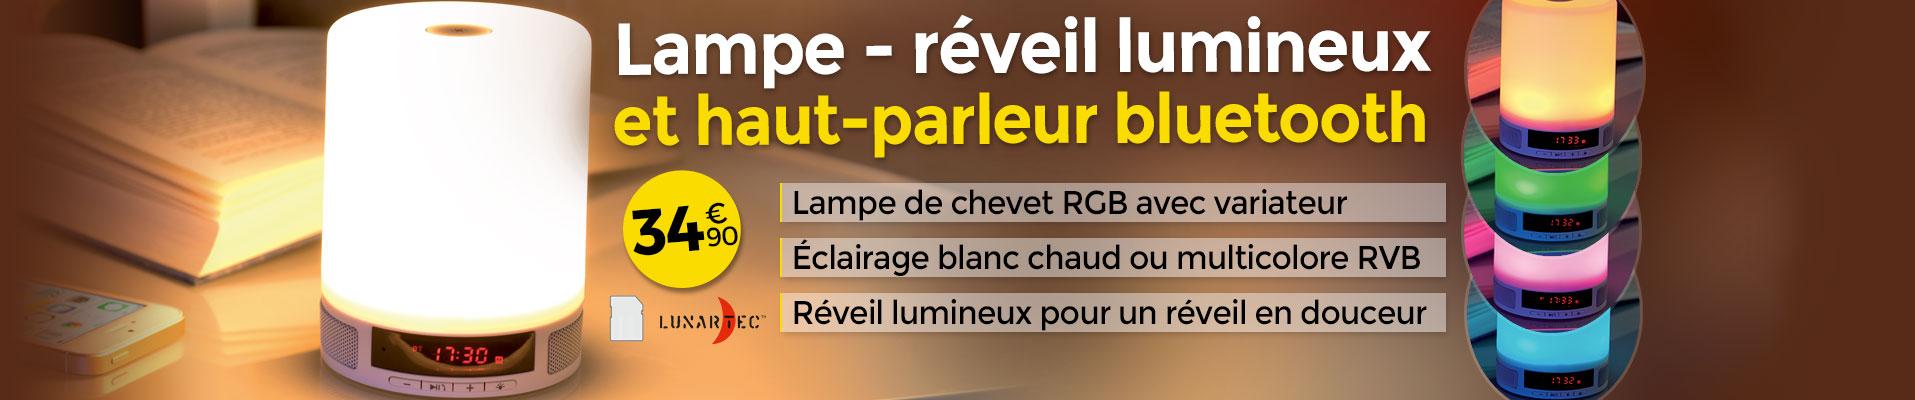 Application Reveil Lumineux Iphone